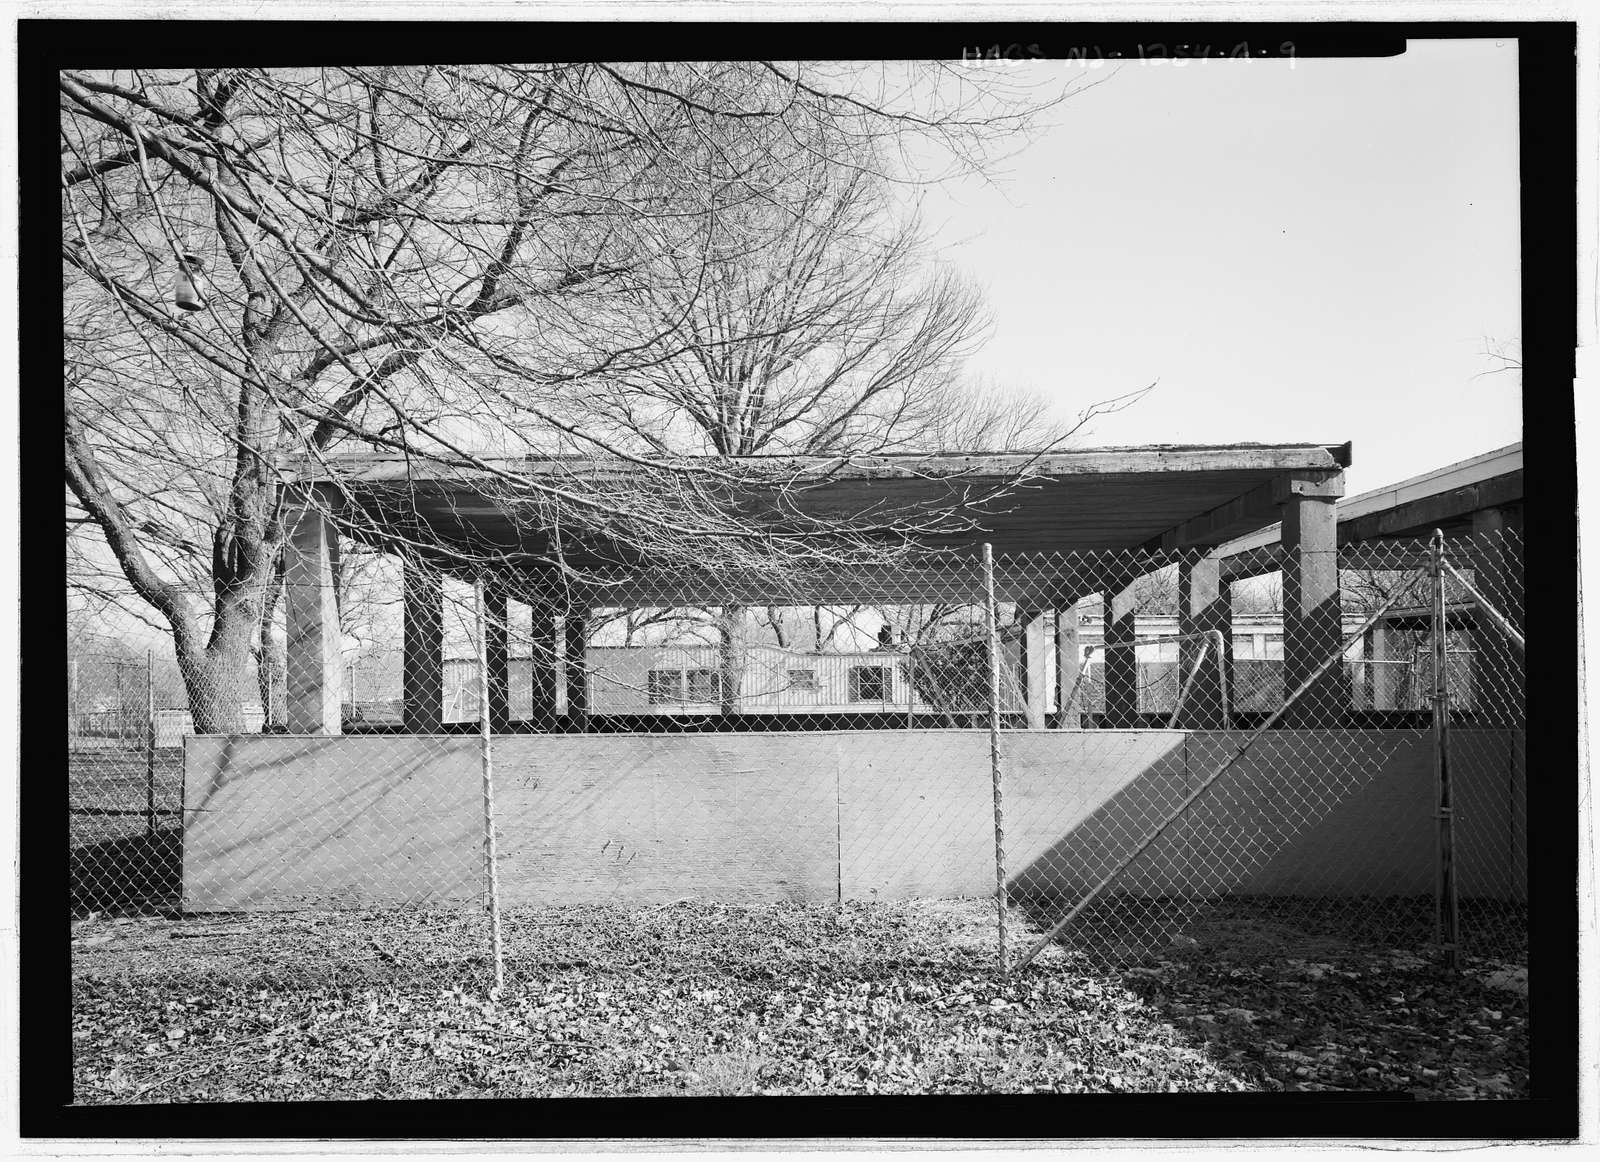 Trenton Jewish Community Center, Day Camp Pavilions, 999 Lower Ferry Road, Ewing, Mercer County, NJ